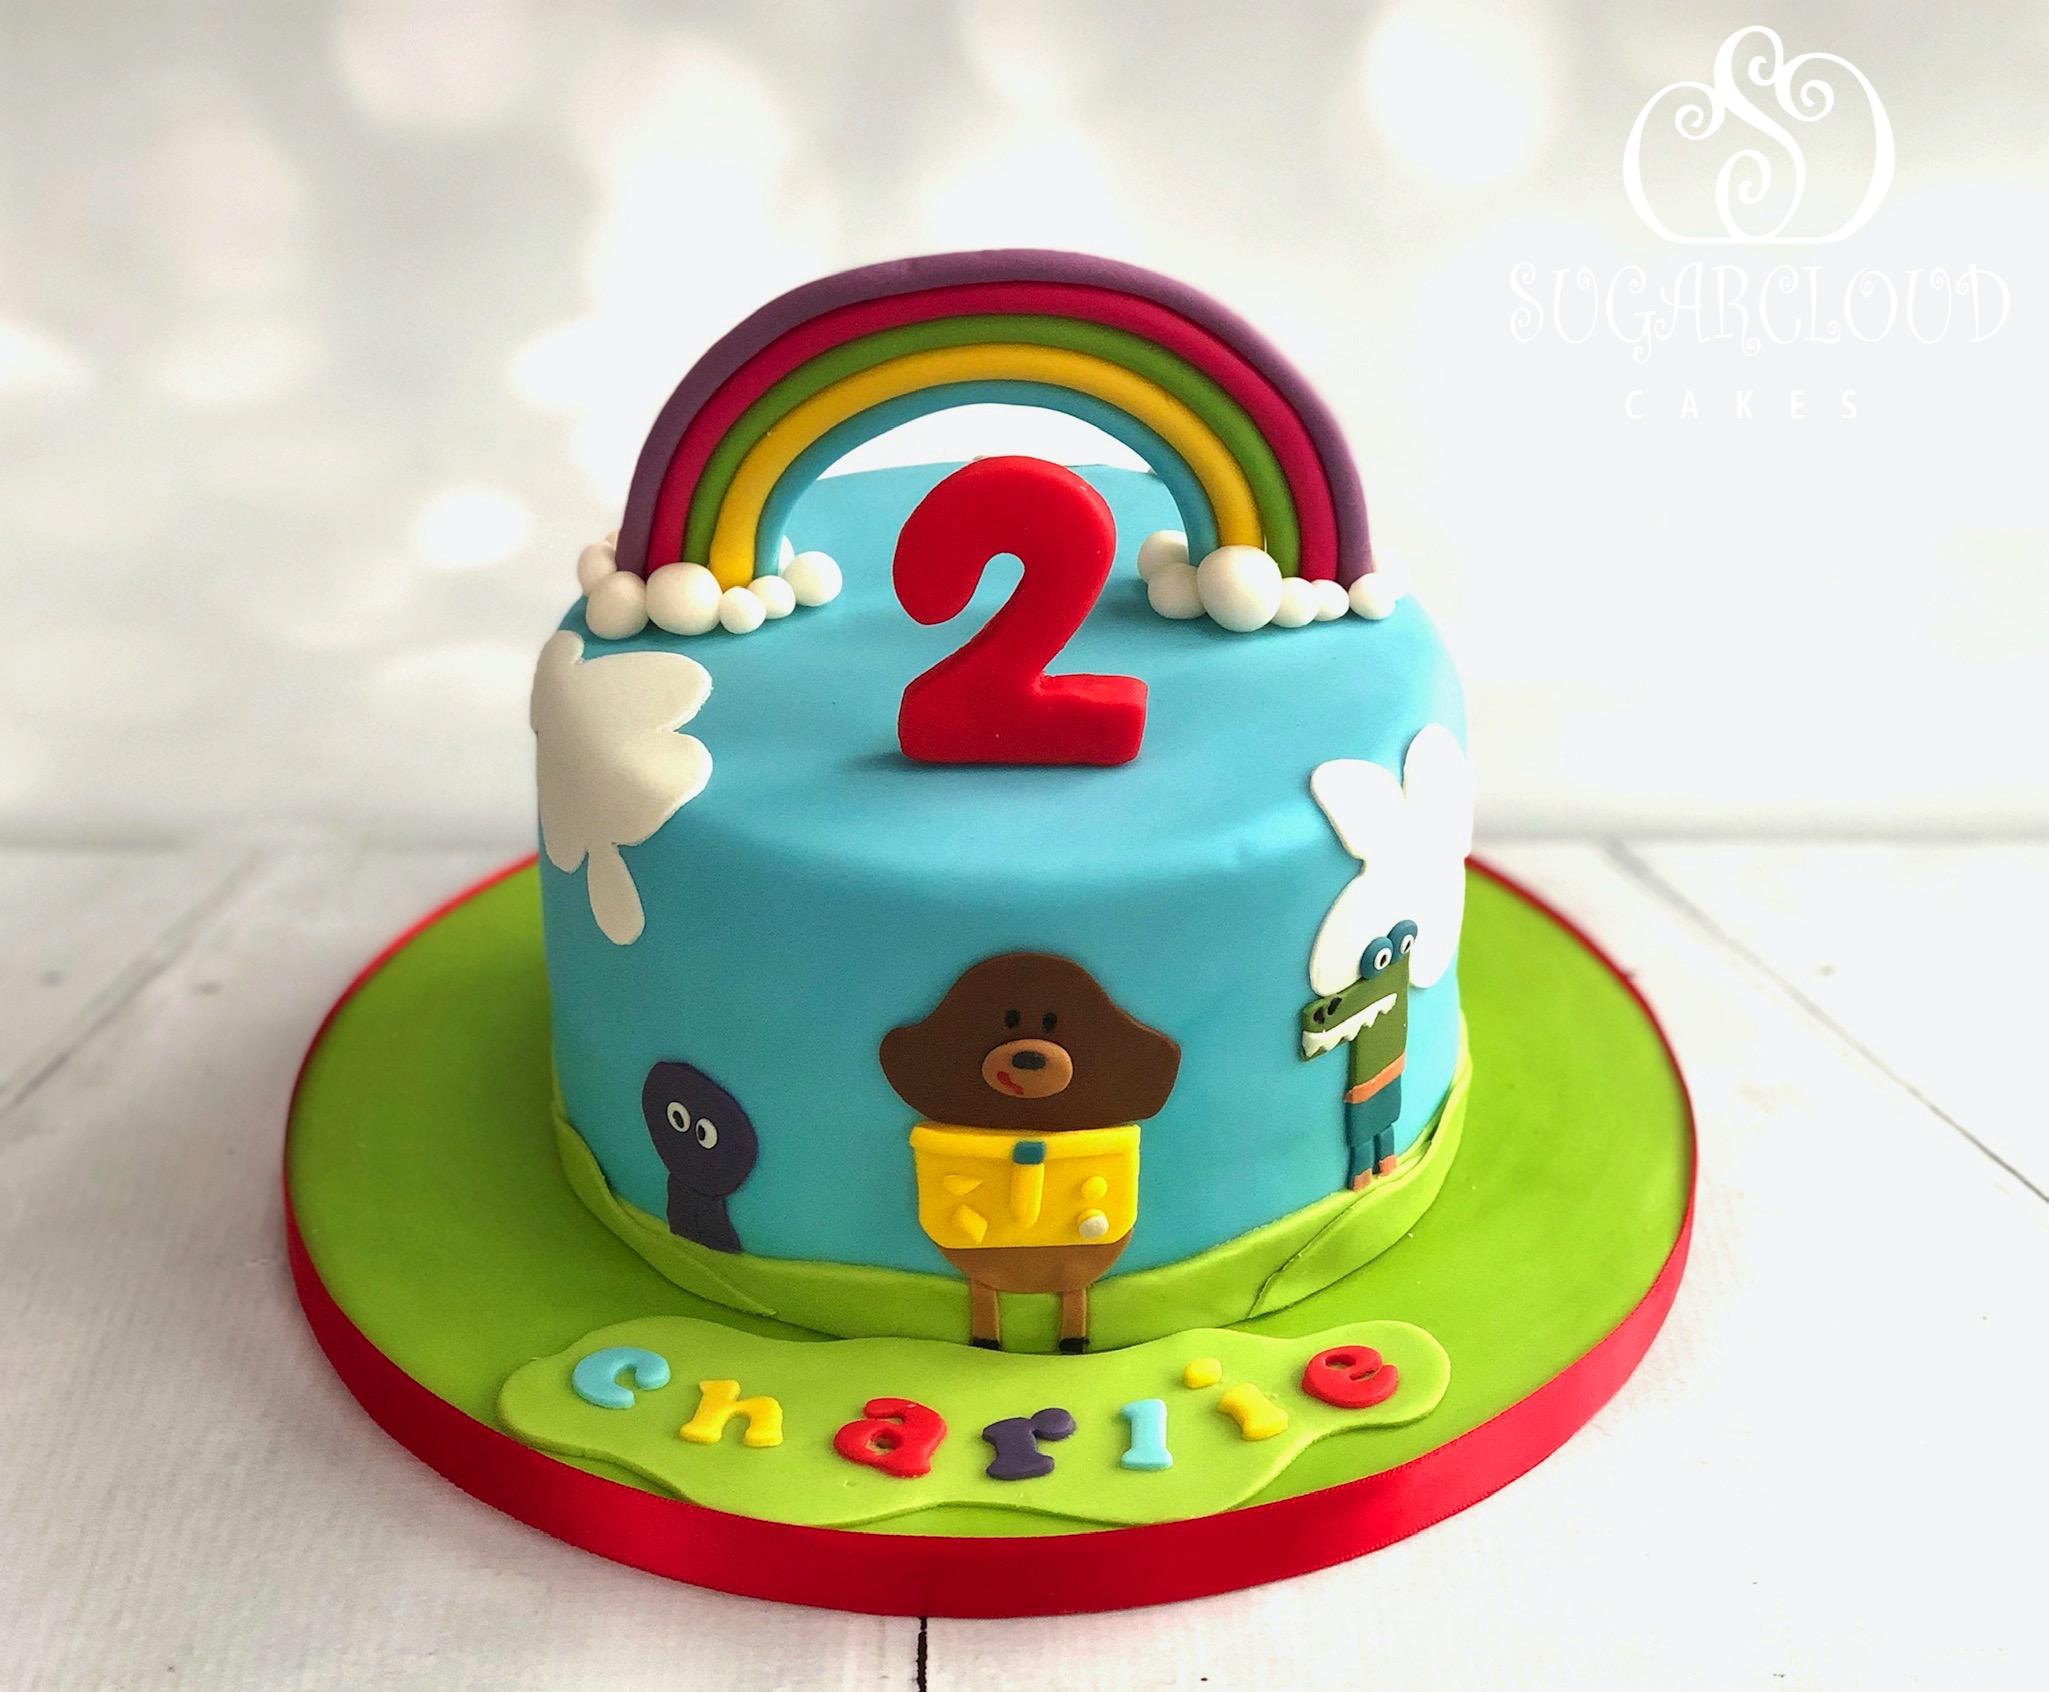 A Hey Duggee Themed 2nd Birthday Cake